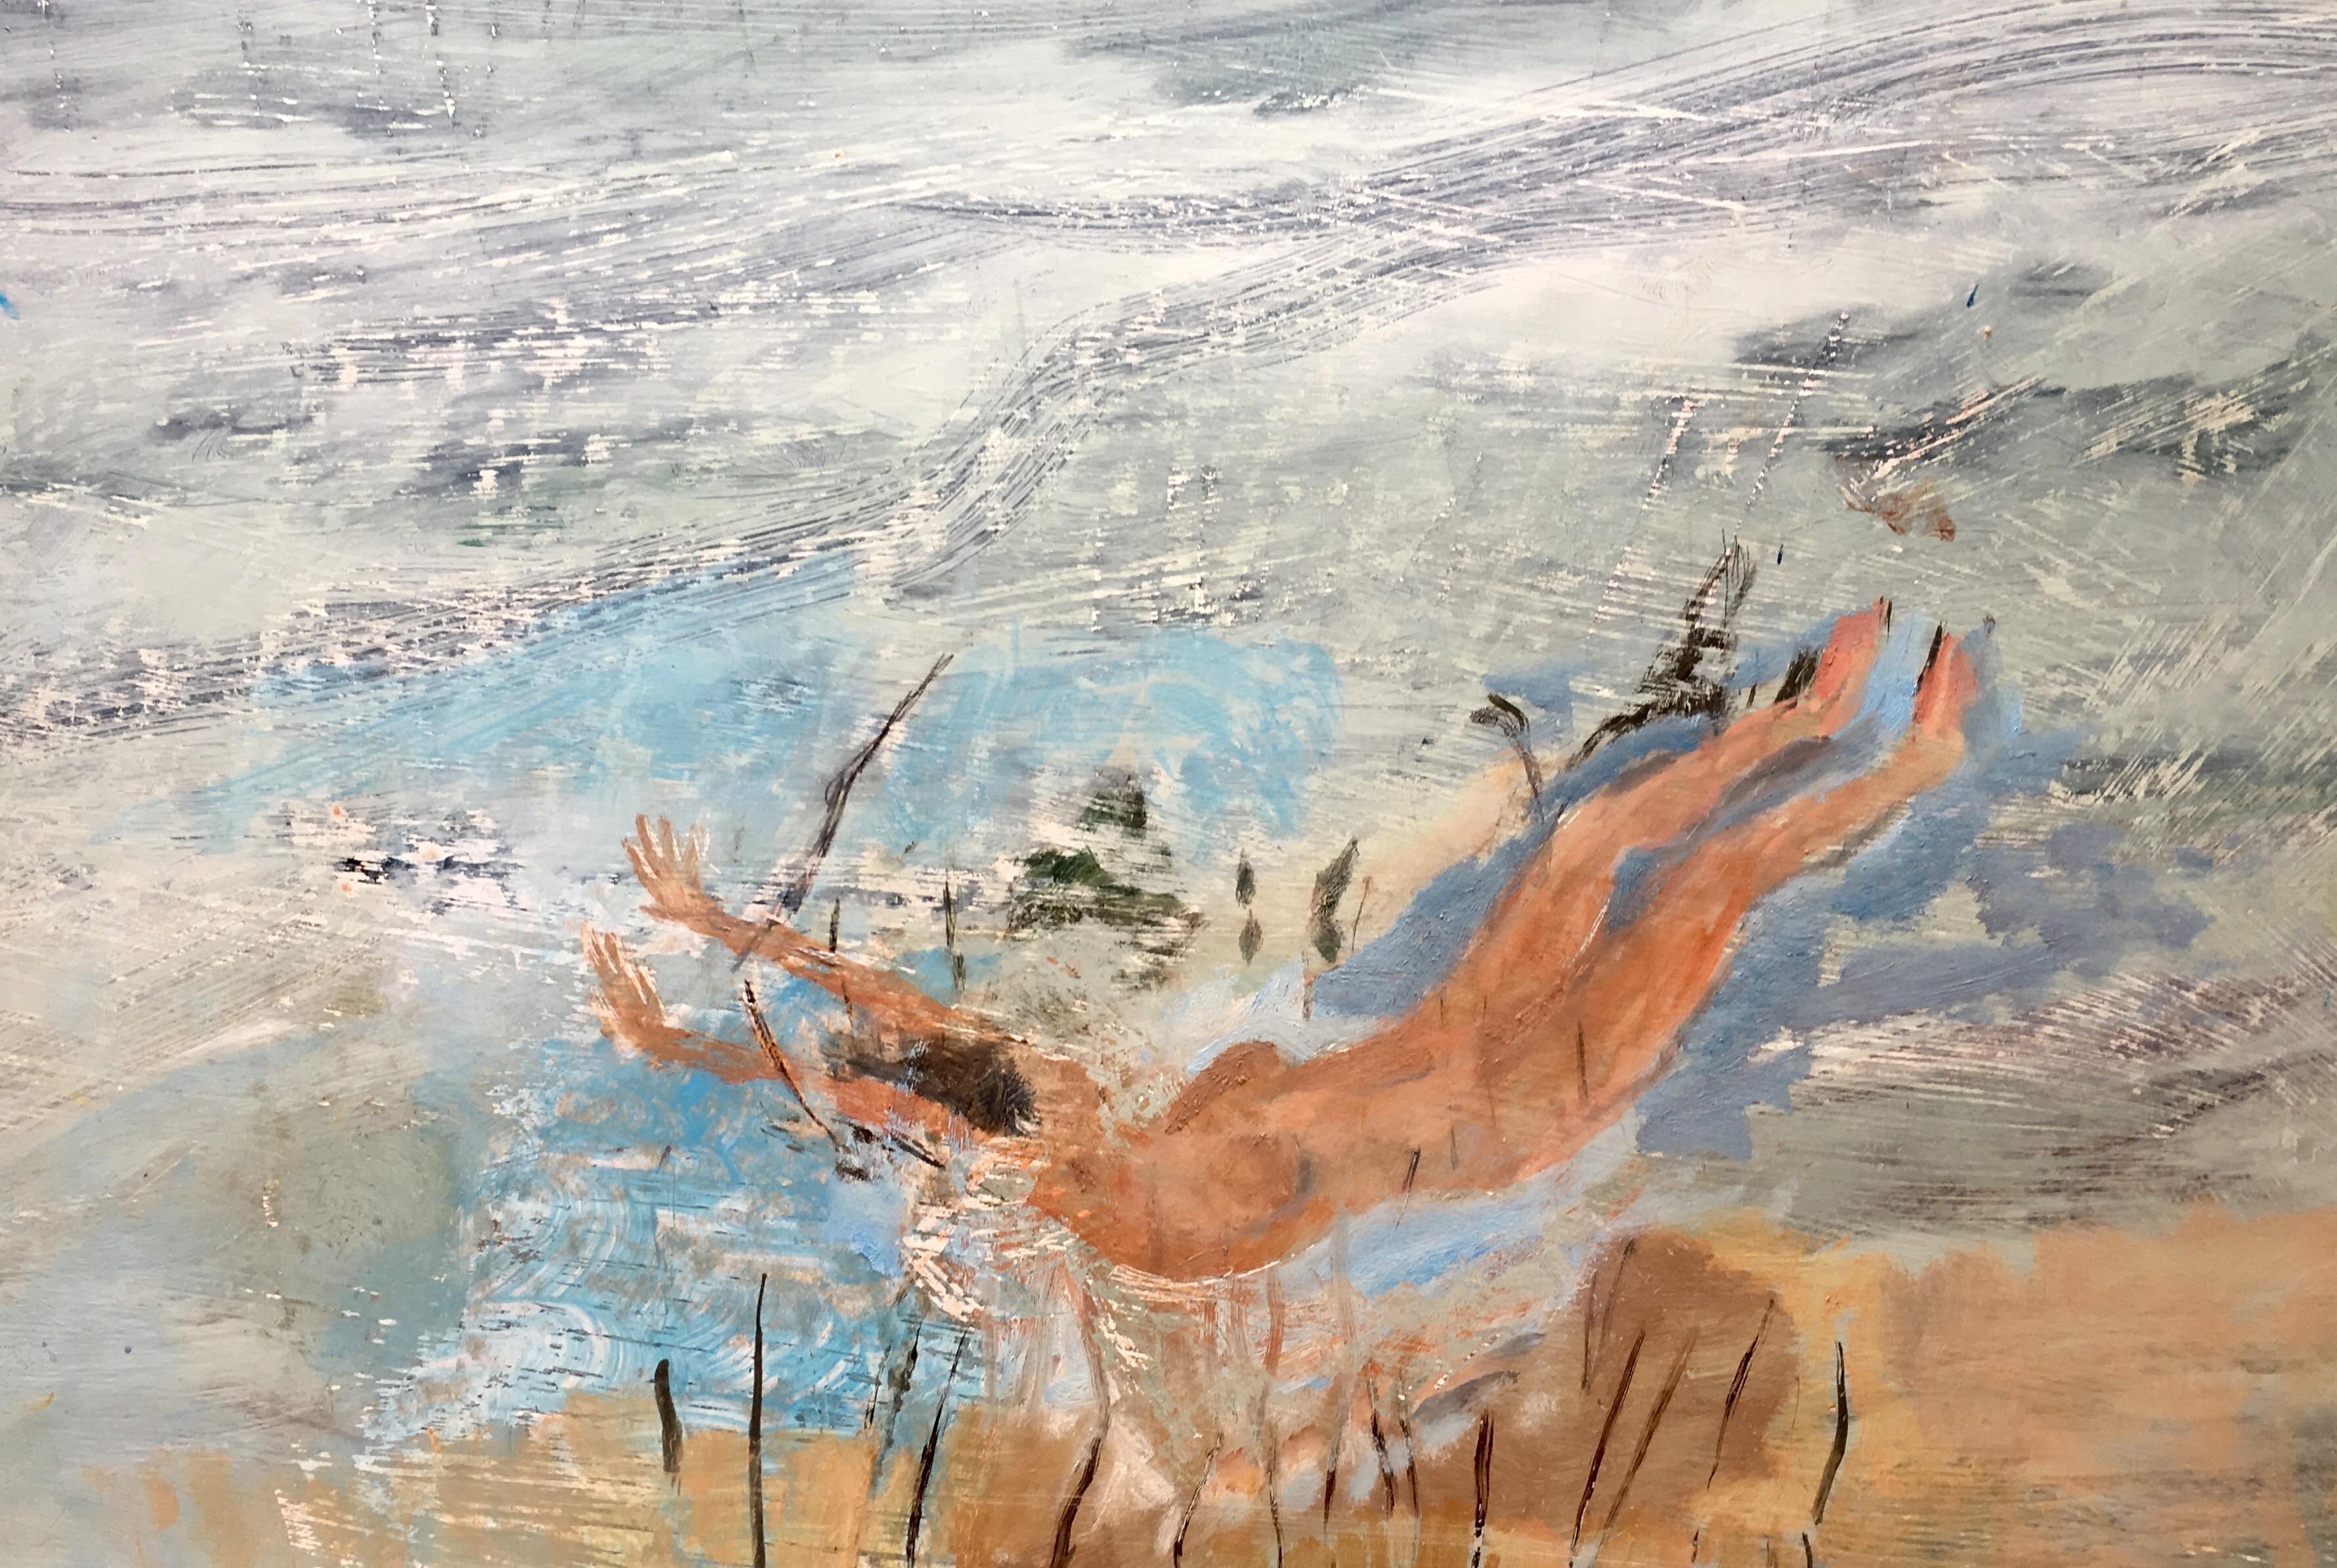 Napper River Swimmer